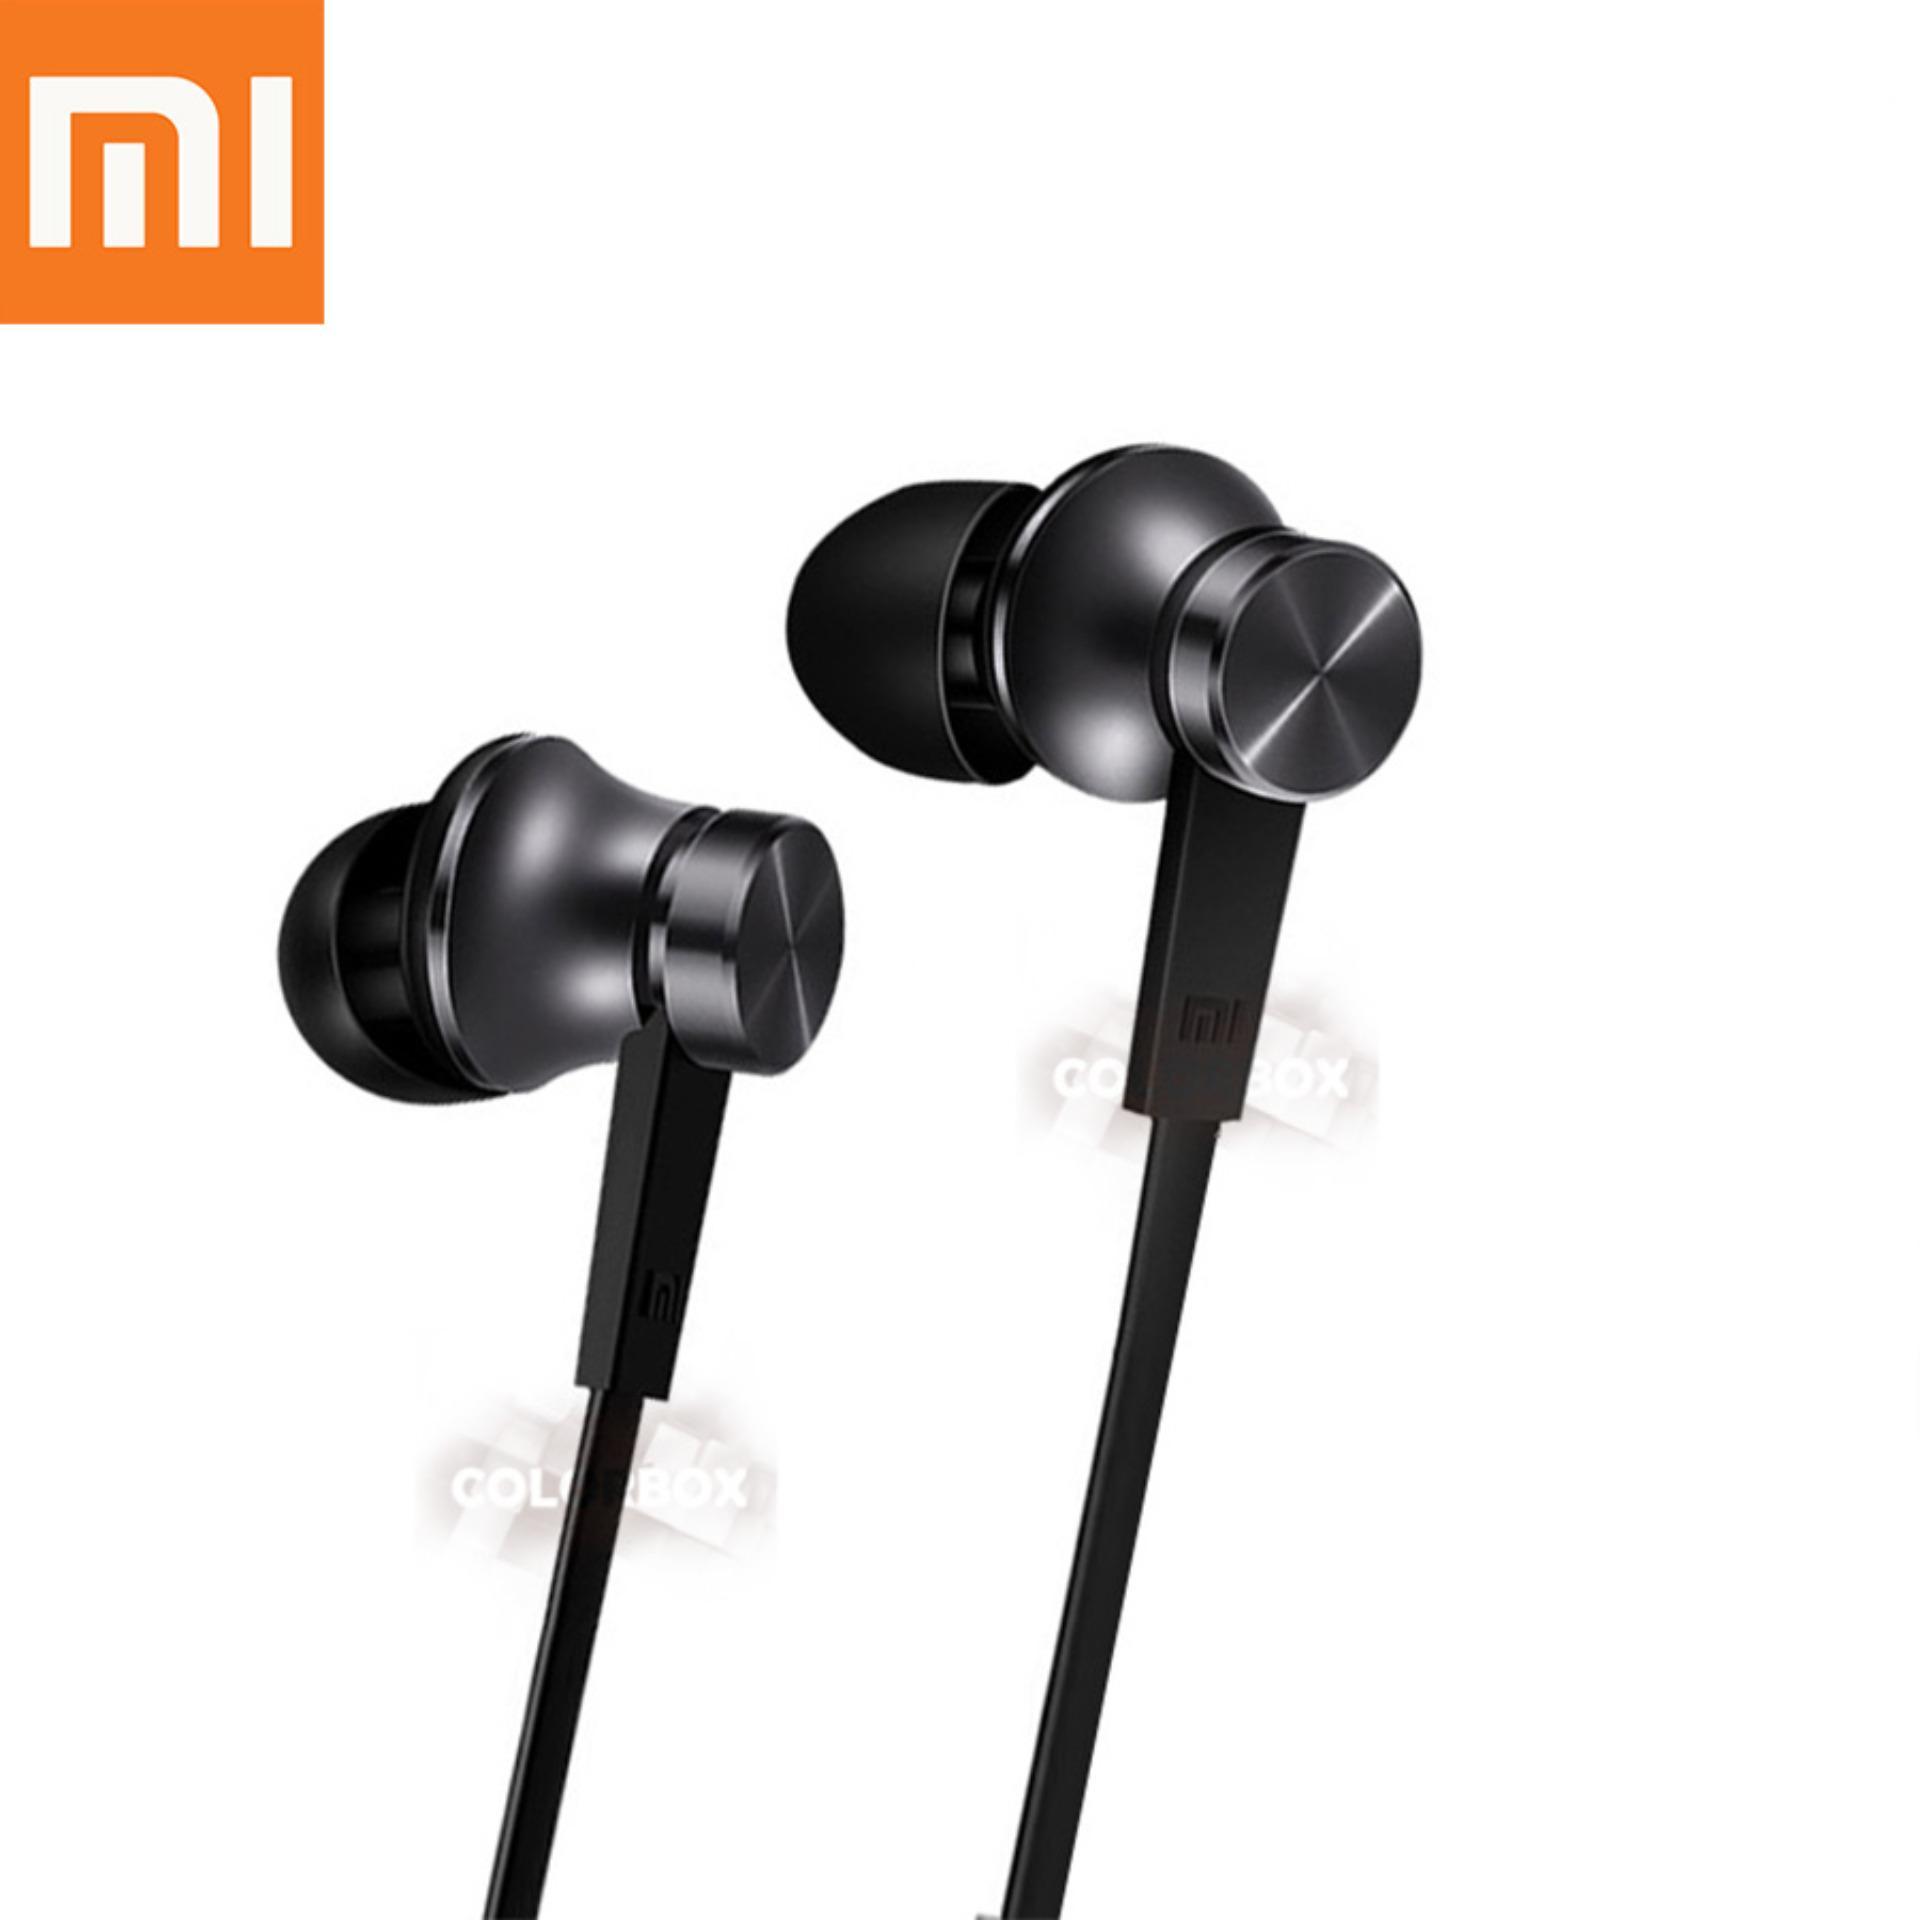 Xiaomi Mi Piston Huosai Earphone Colorful Edition Hitam Daftar Oem Silver In Ear Original 3rd Gen Handsfree Headset